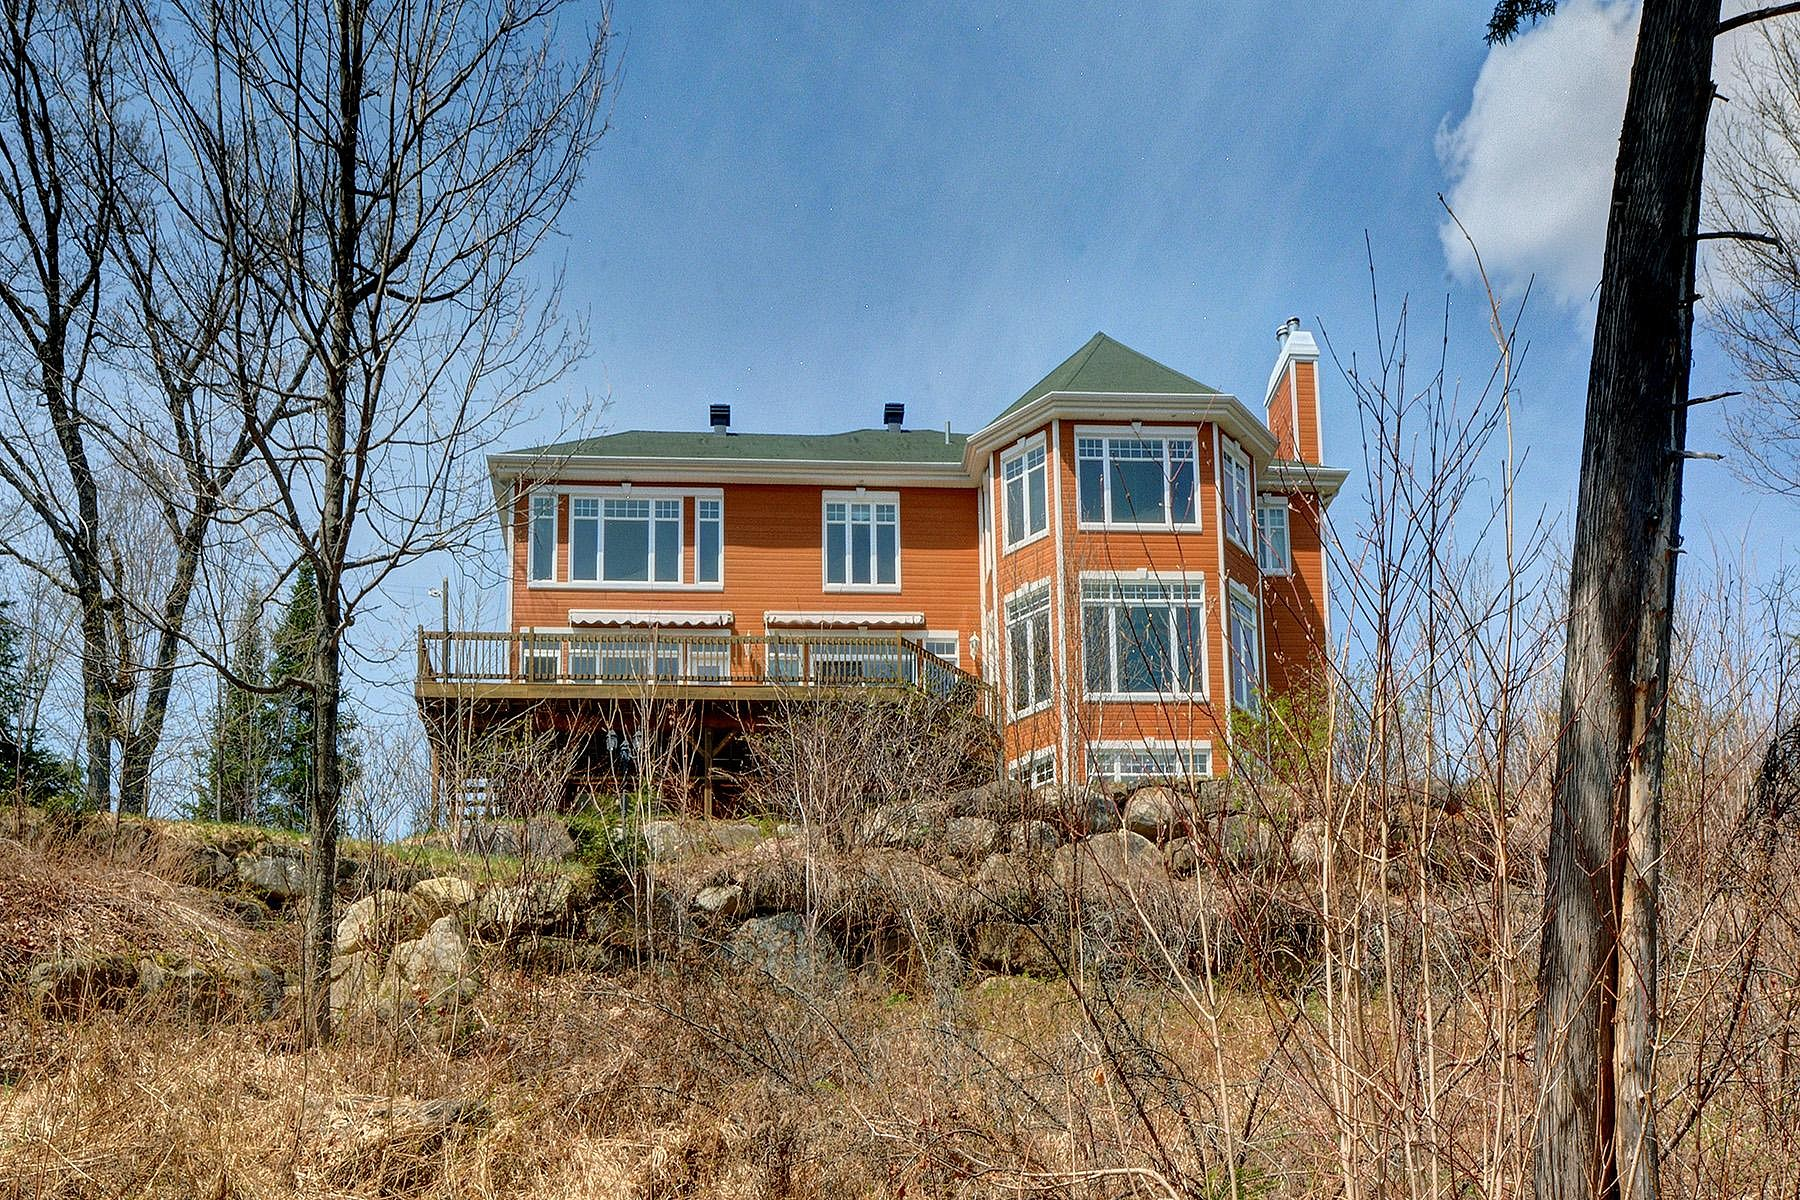 Tek Ailelik Ev için Satış at Saint-Donat, Lanaudière 4 Ch. Bouchard Saint-Donat, Quebec J0T2C0 Kanada